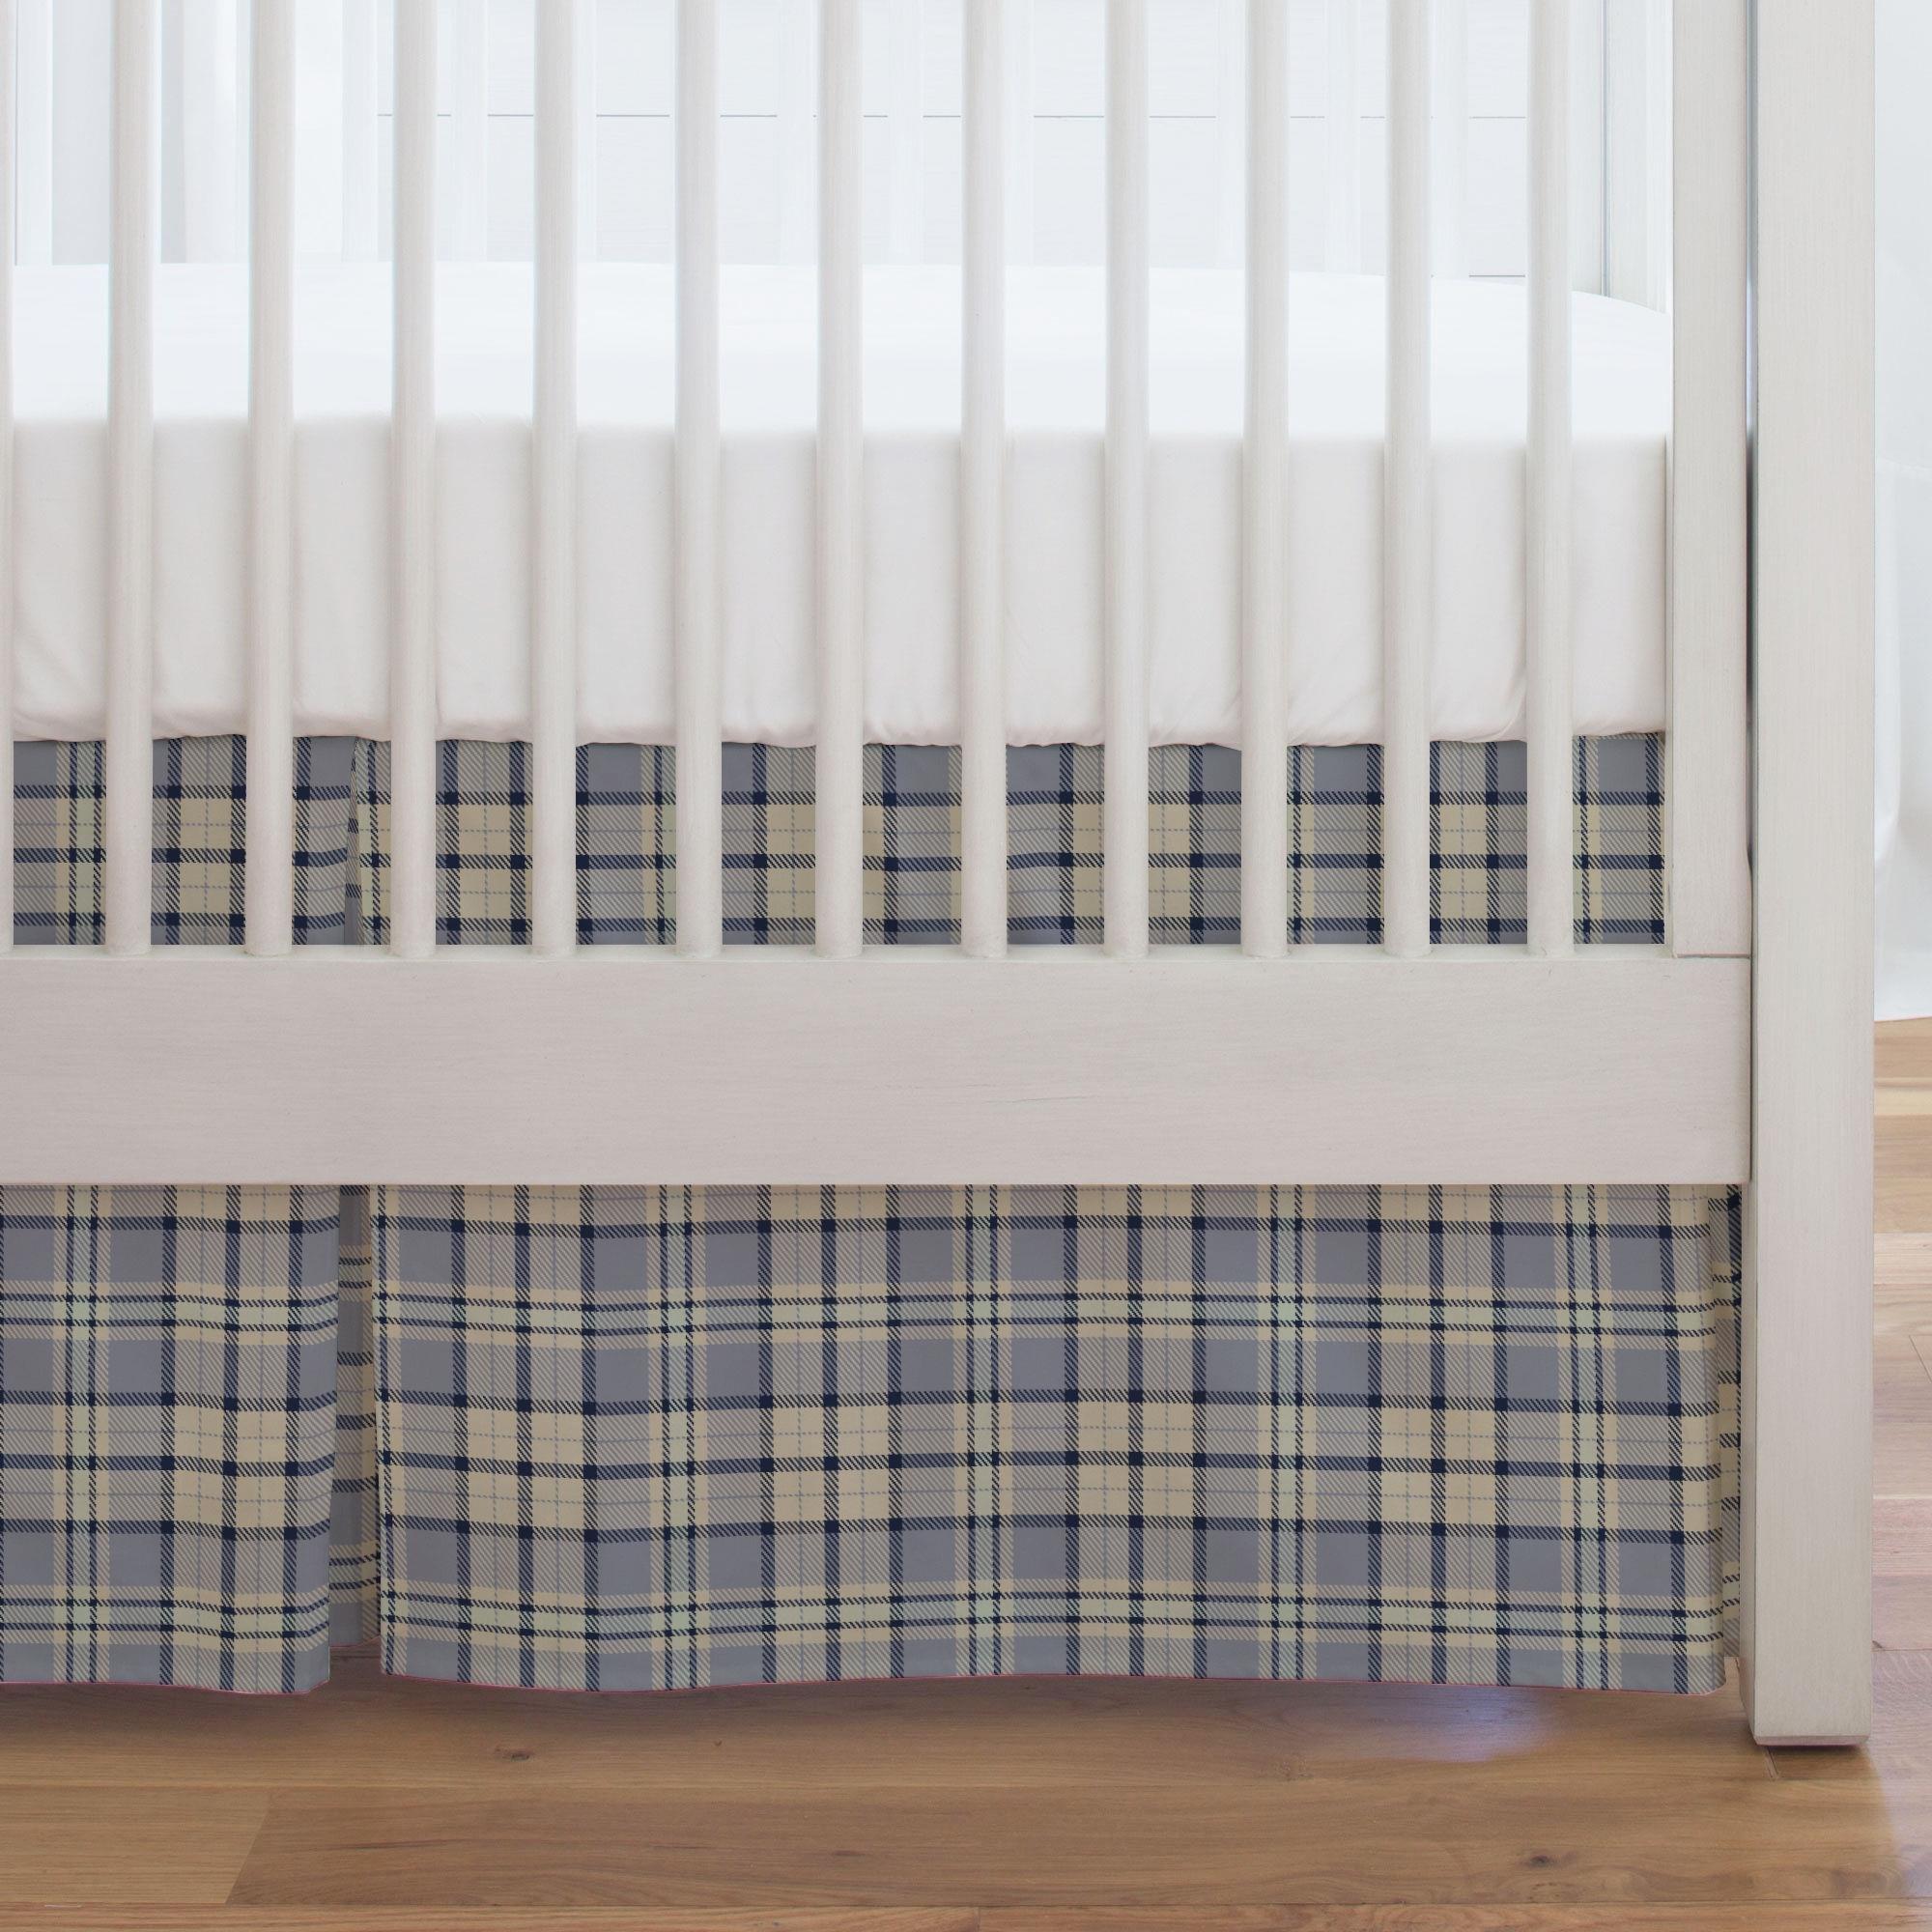 Carousel Designs Seafoam and River Plaid Crib Skirt Single-Pleat 17-Inch Length - Organic 100% Cotton Crib Skirt - Made in The USA by Carousel Designs